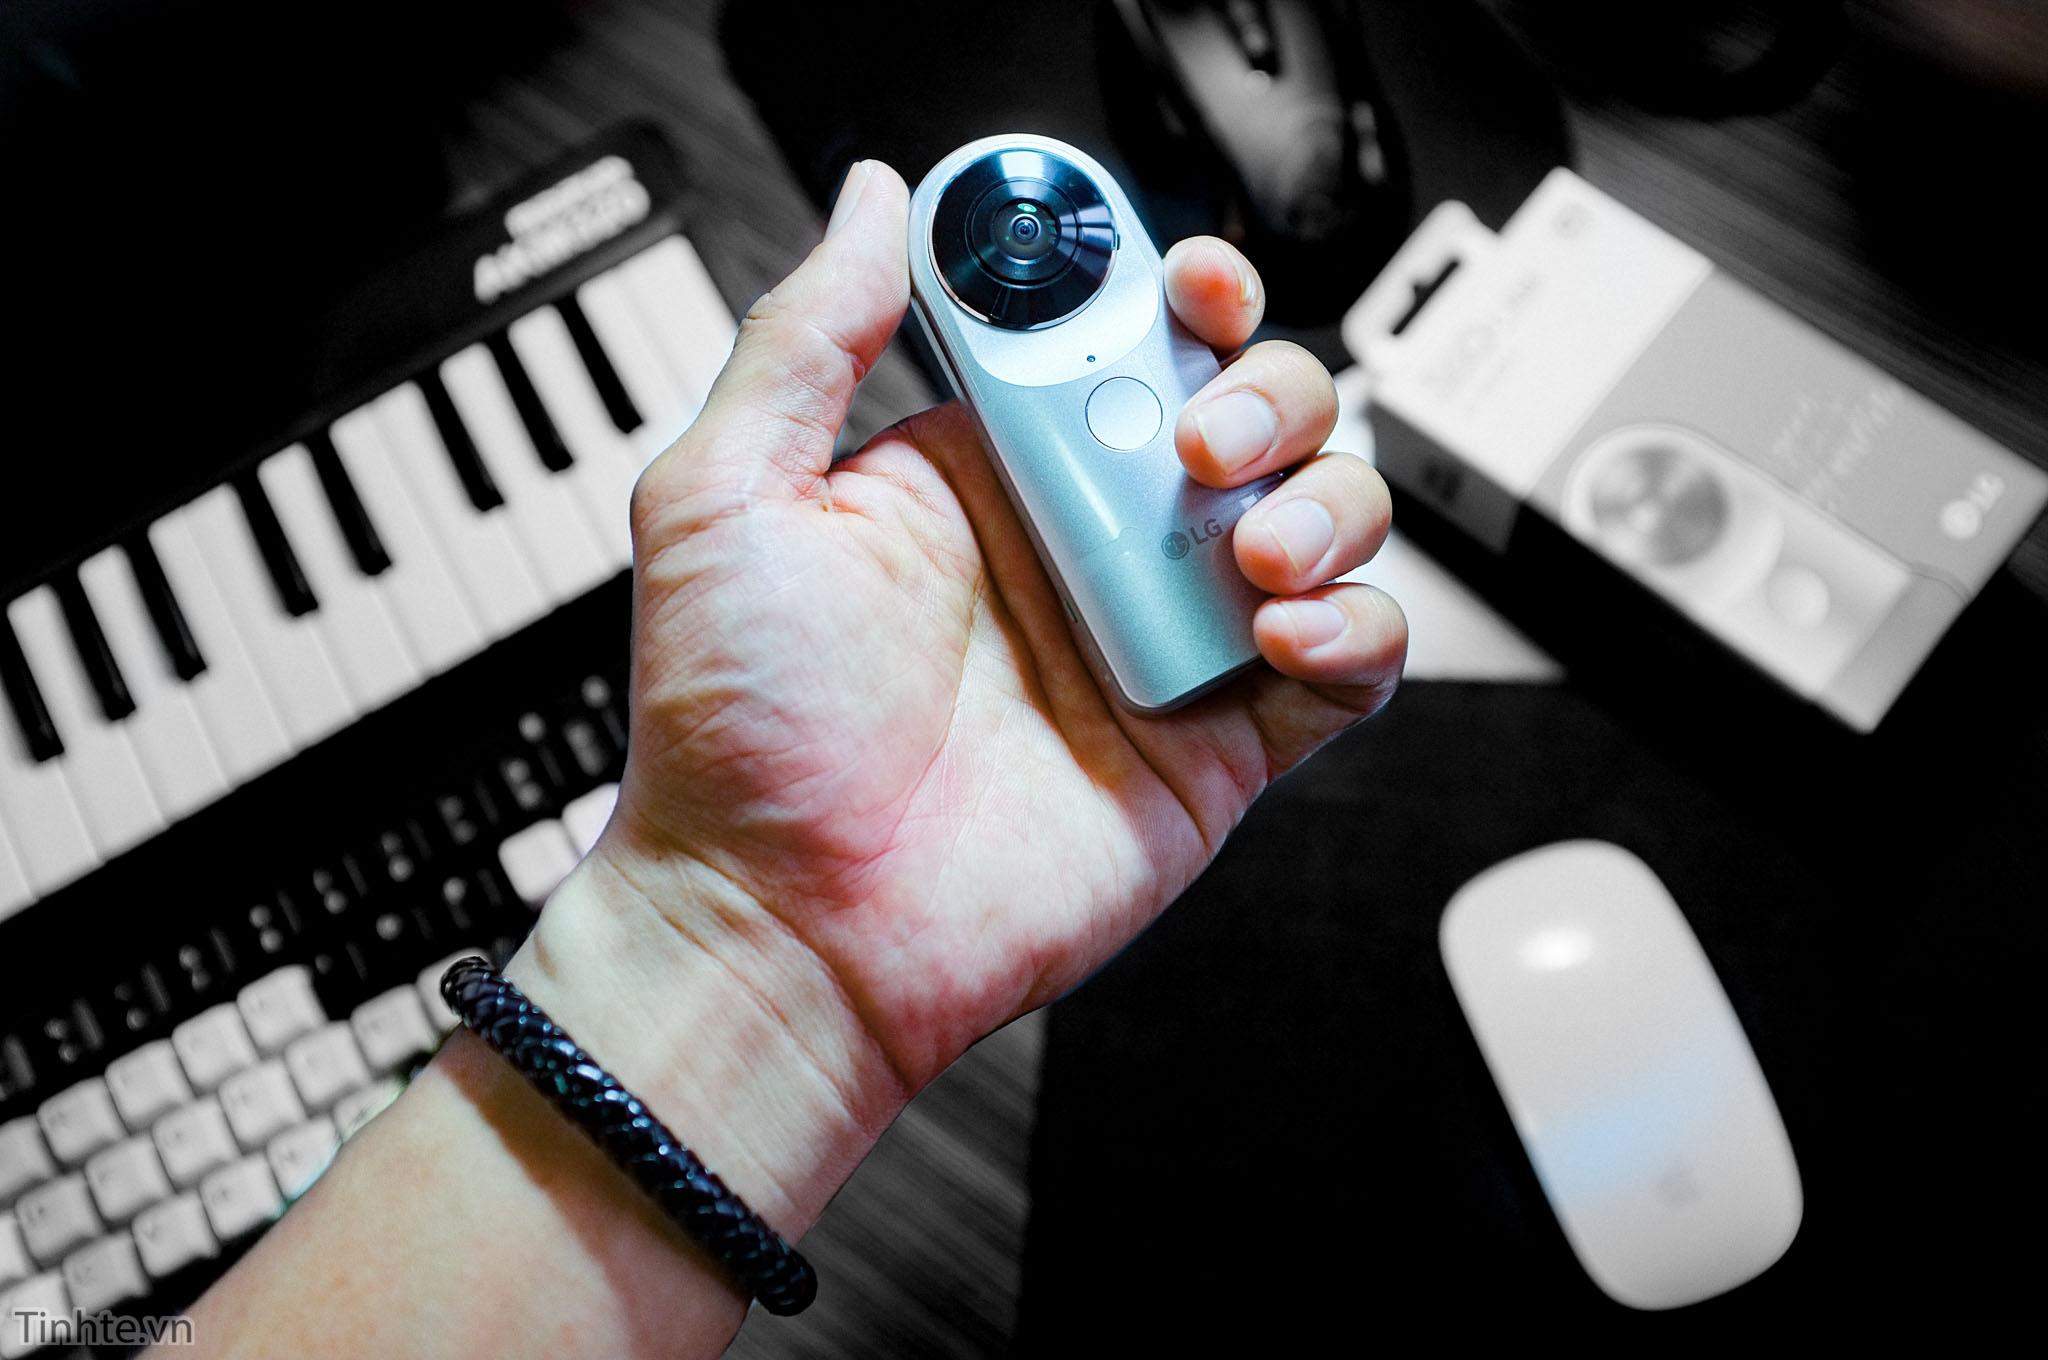 Lg-360cam-tinhte-7.jpg